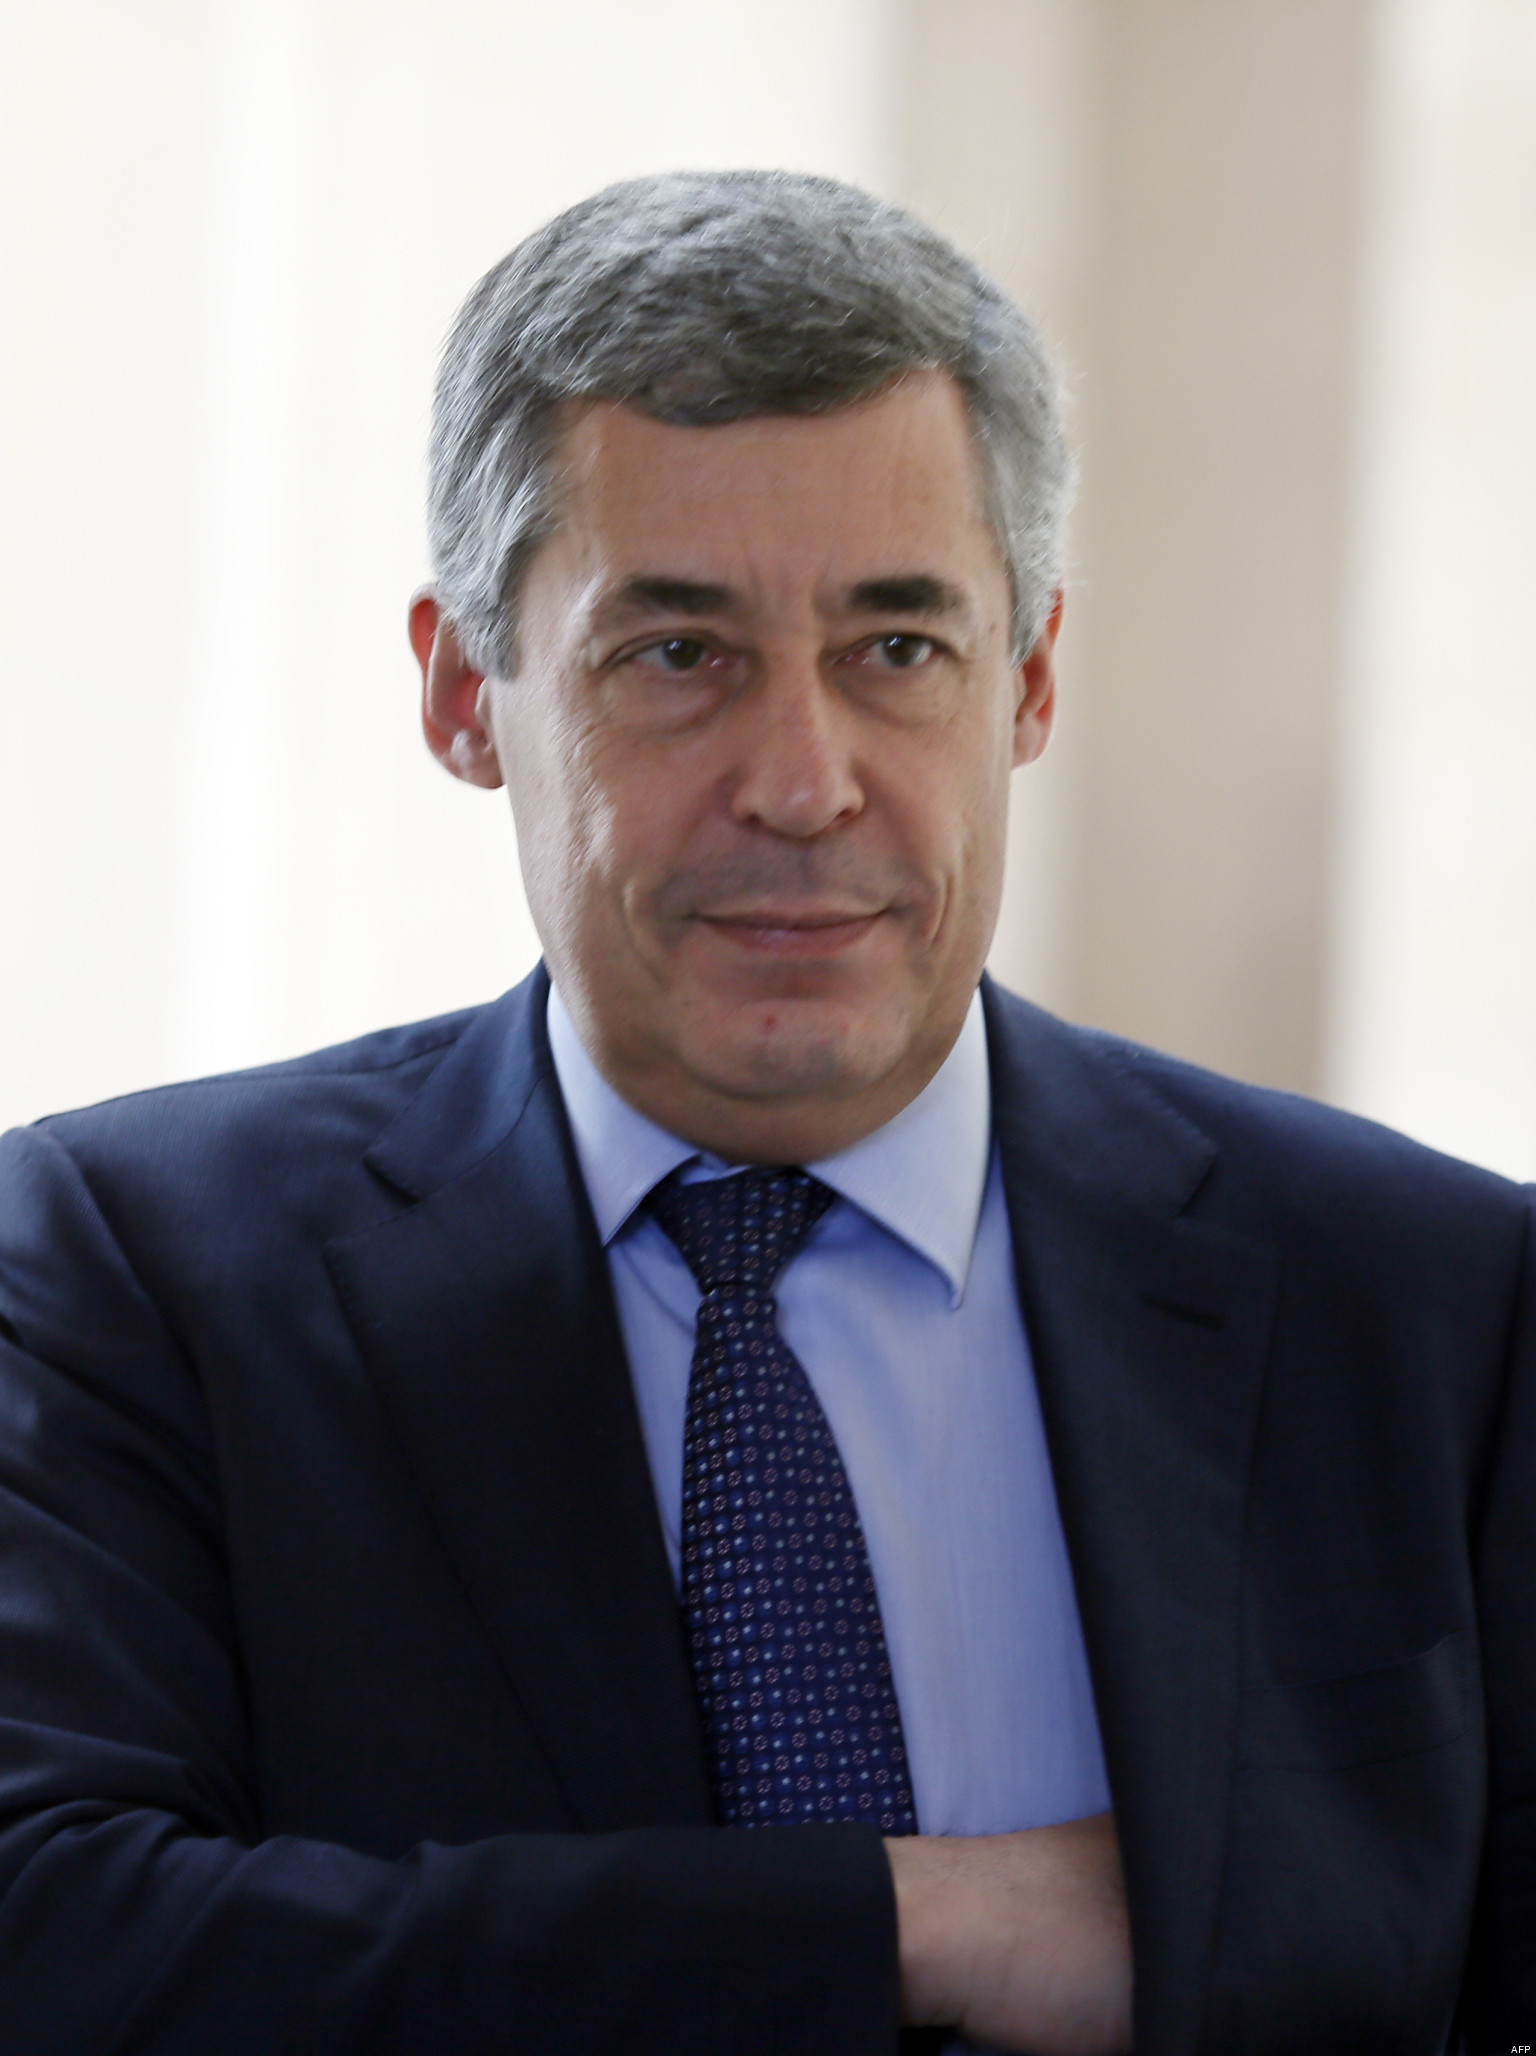 Henri Guaino élection presidentielle 2017, candidat